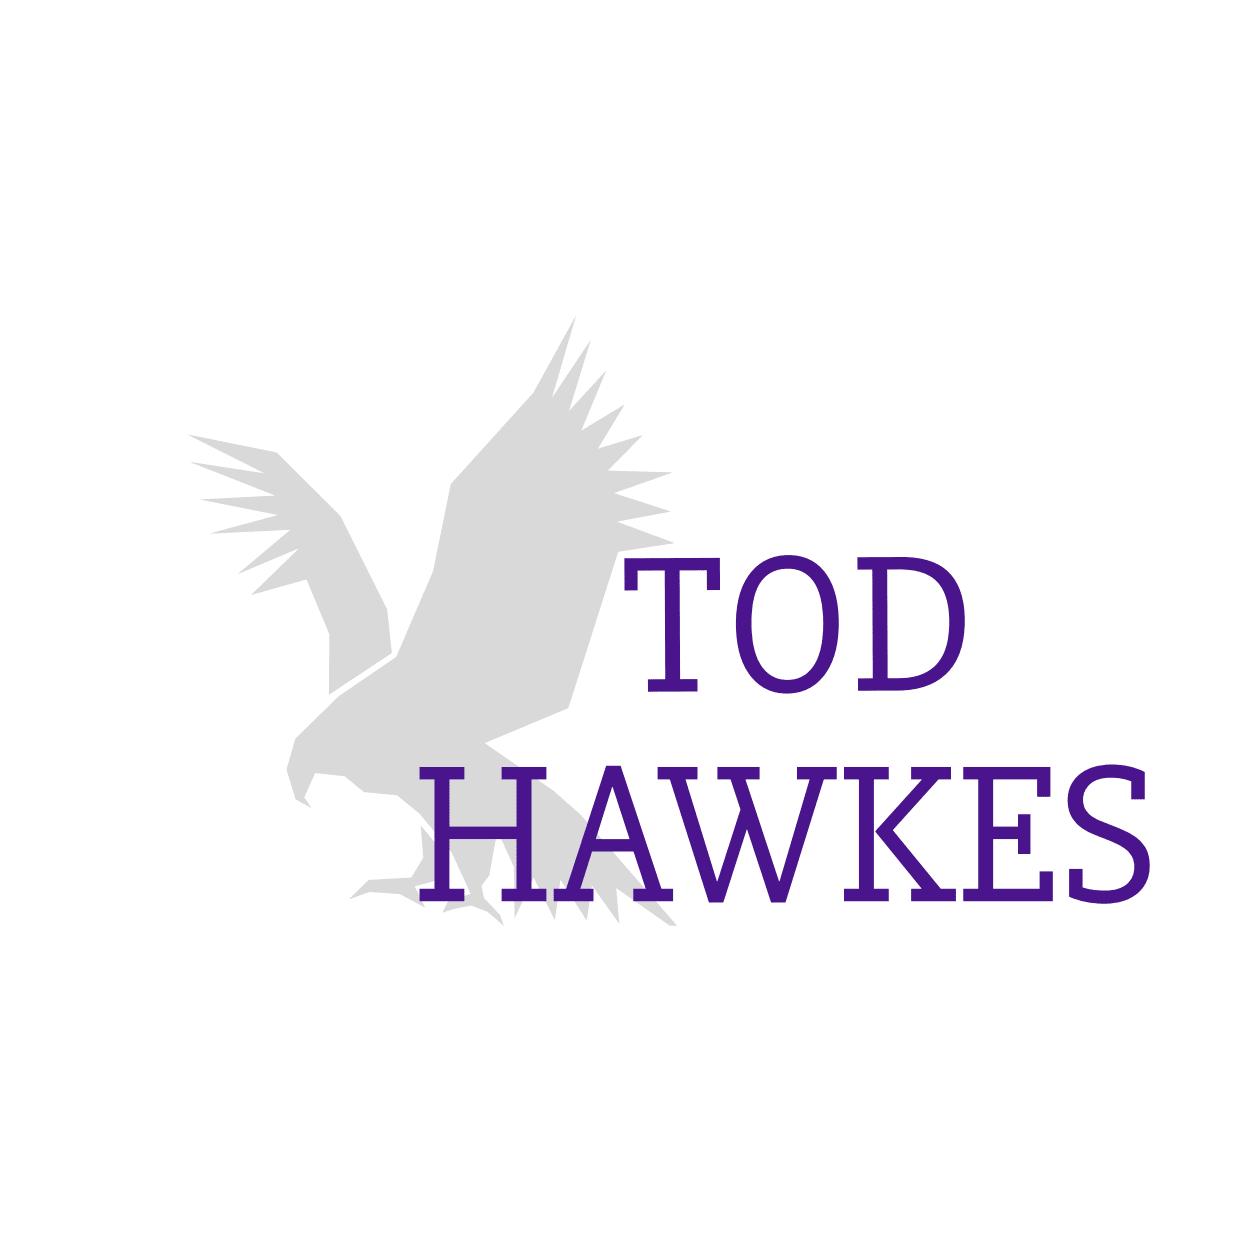 TodHawkes - Builder - Leighton Buzzard, Bedfordshire LU7 2LD - 07708 063878 | ShowMeLocal.com